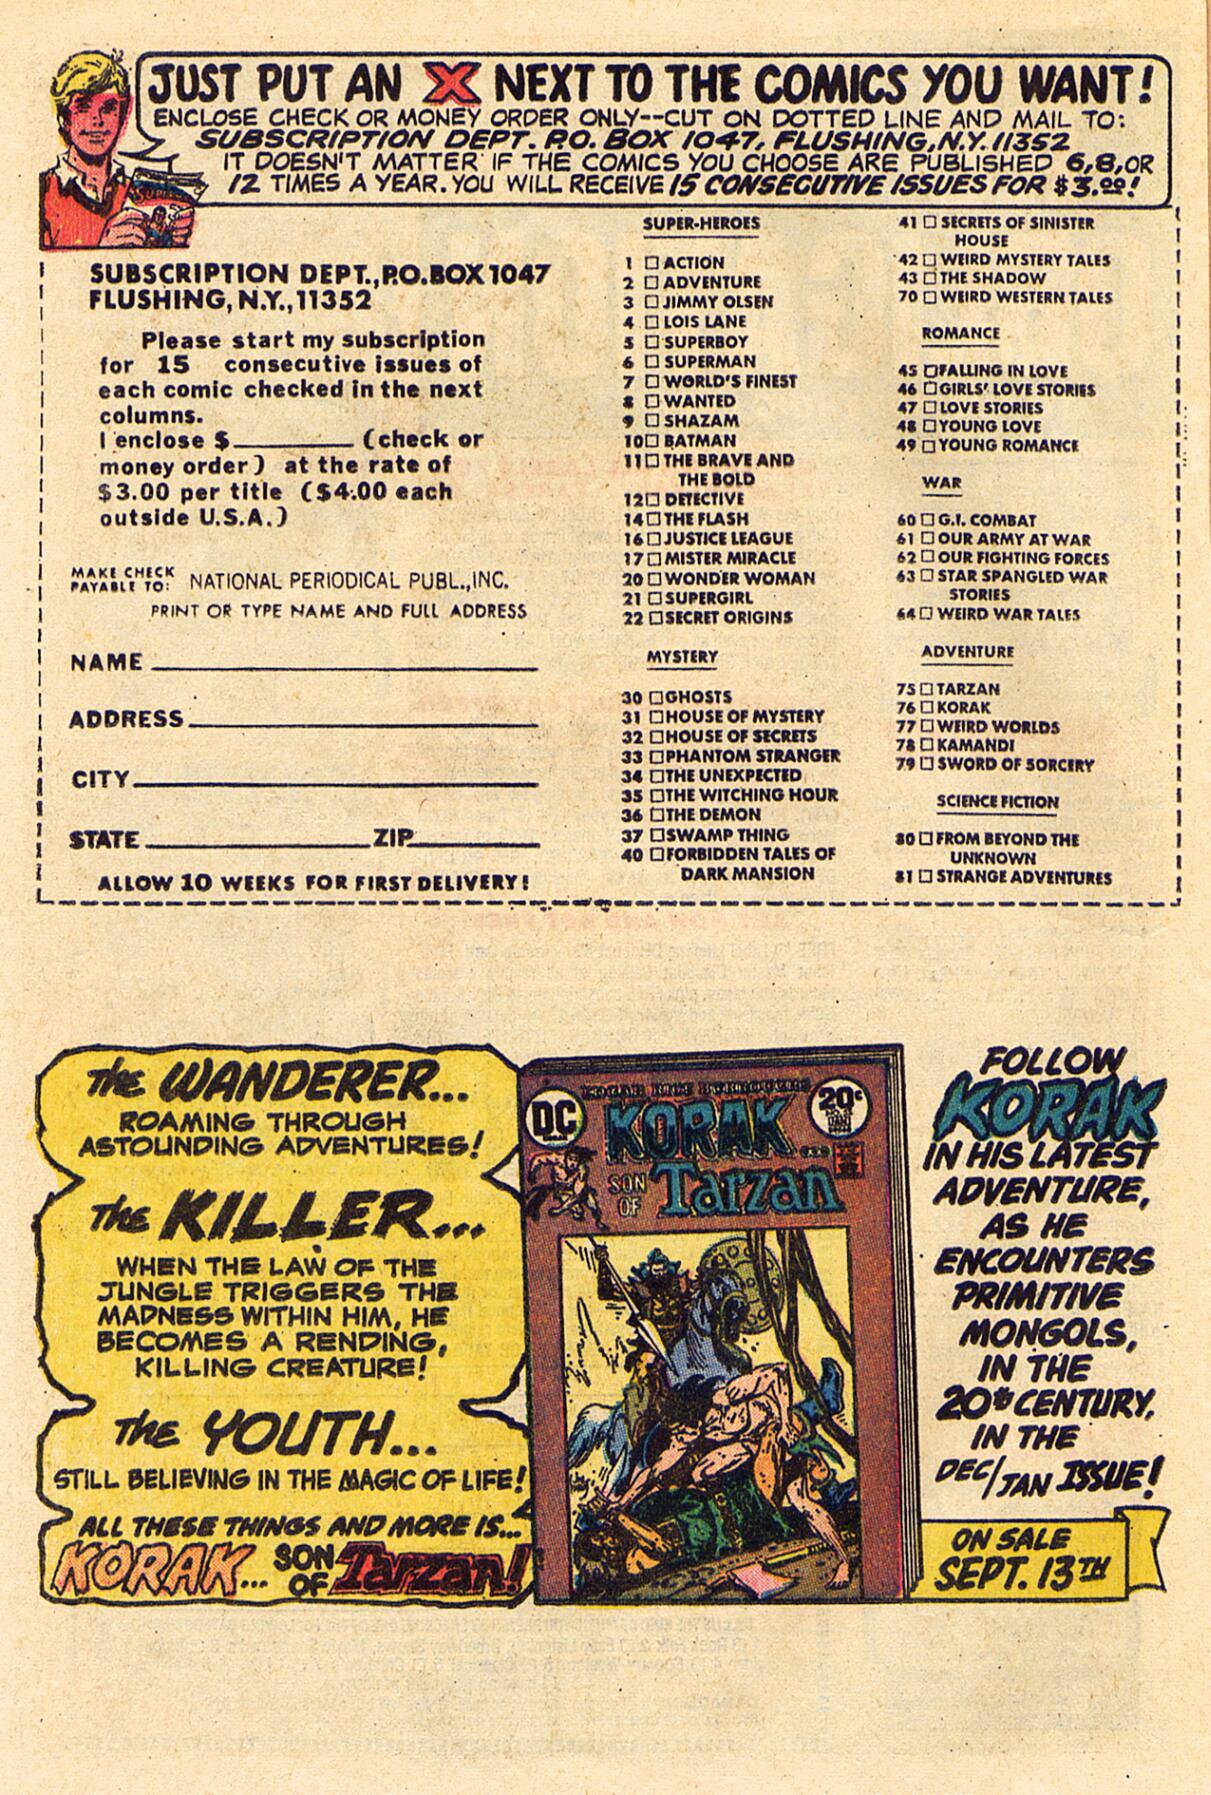 Read online Adventure Comics (1938) comic -  Issue #430 - 18